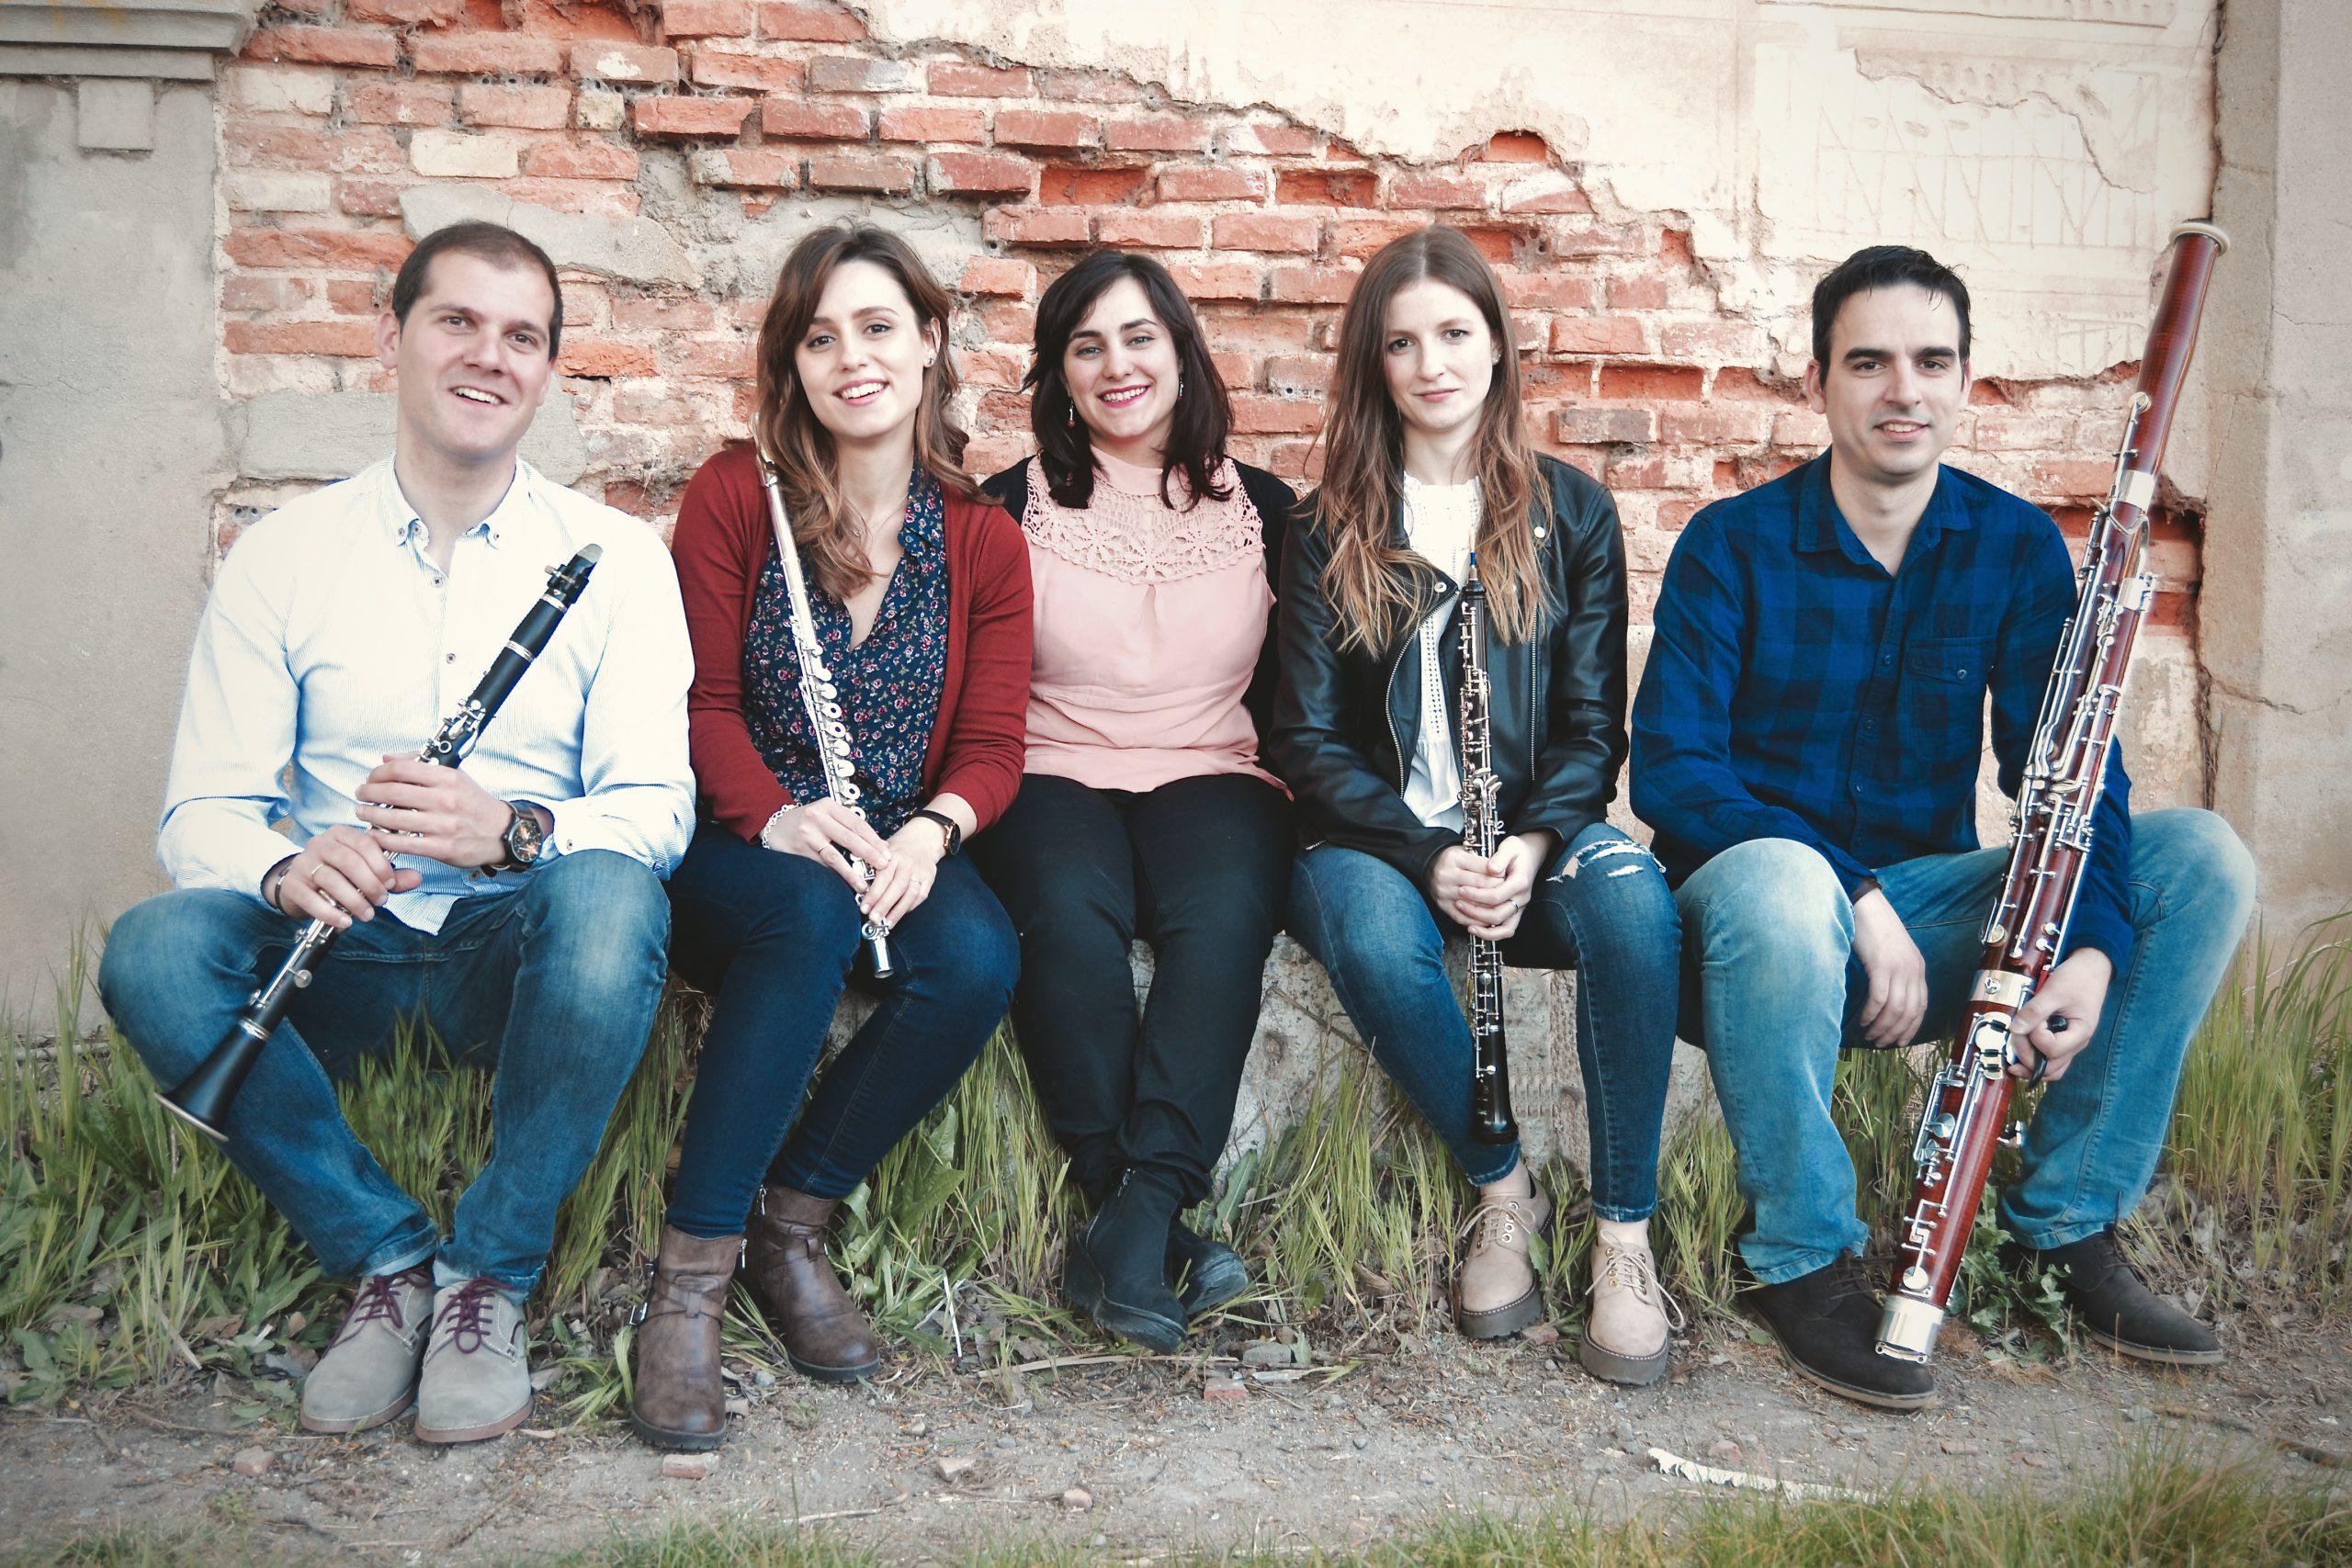 grupo de musicos para conciertos en directo Scherzo